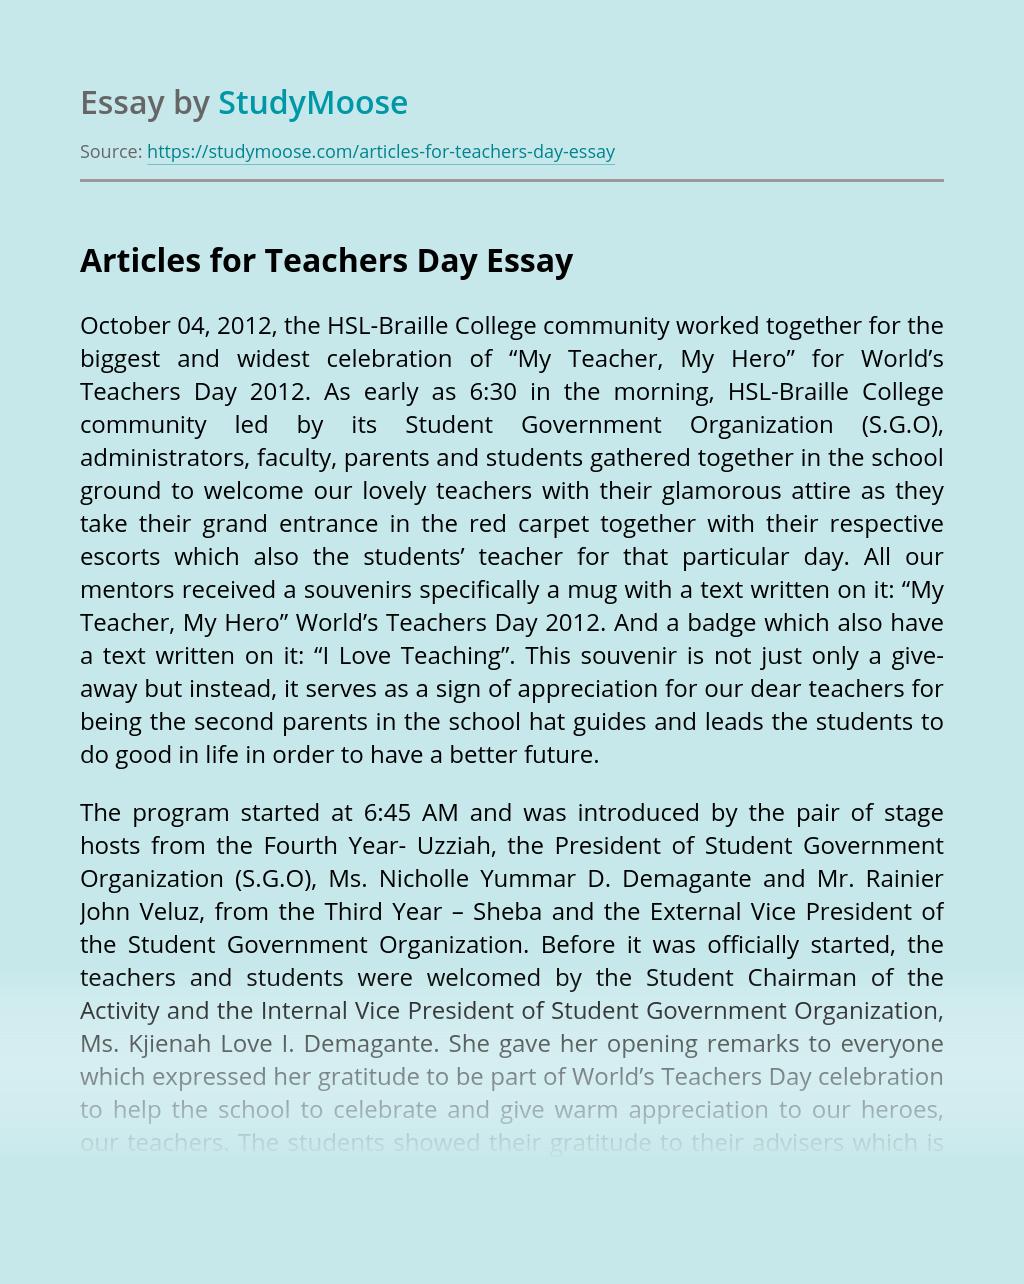 Essay topics for teachers day grahic design business plan sample